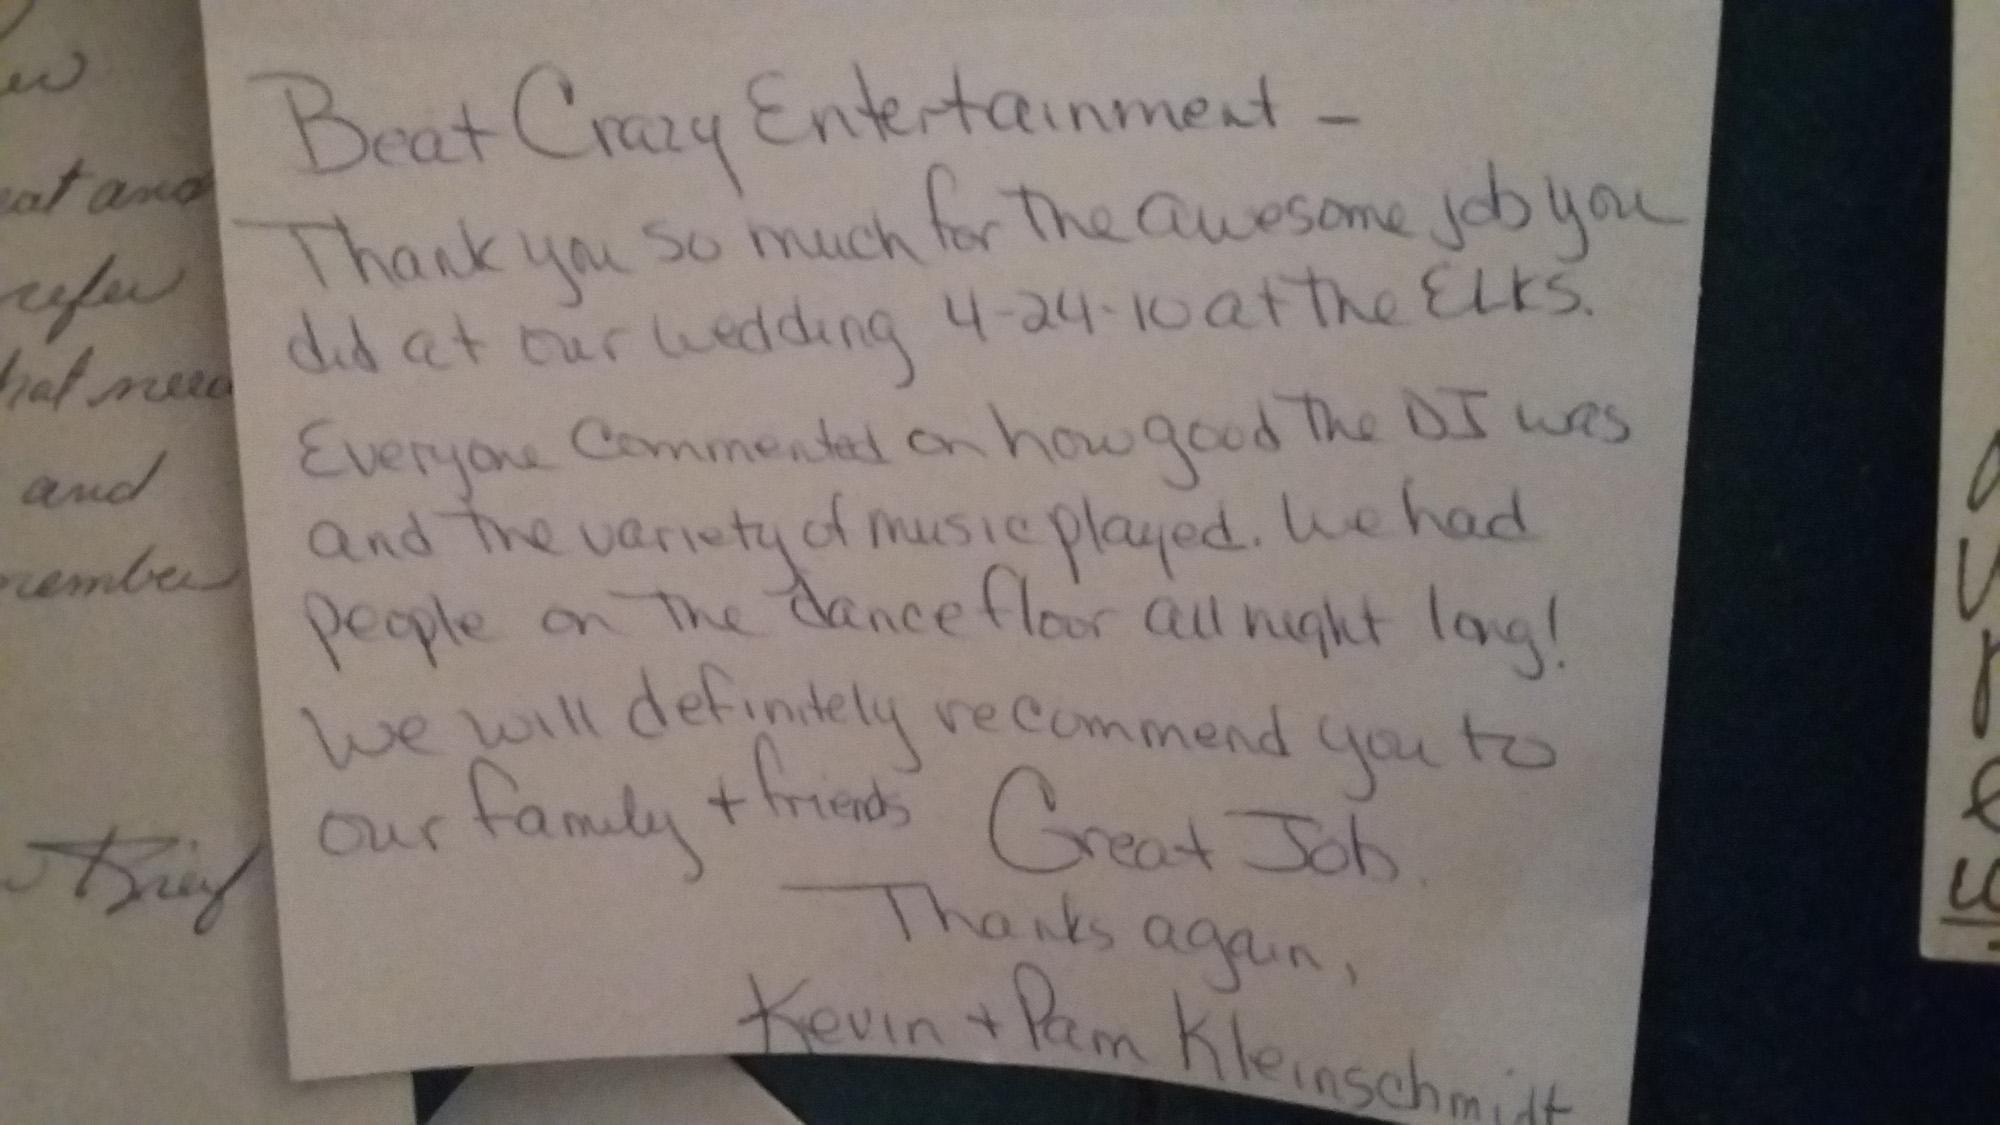 beat-crazy-entertainment-testimonials-05.jpg